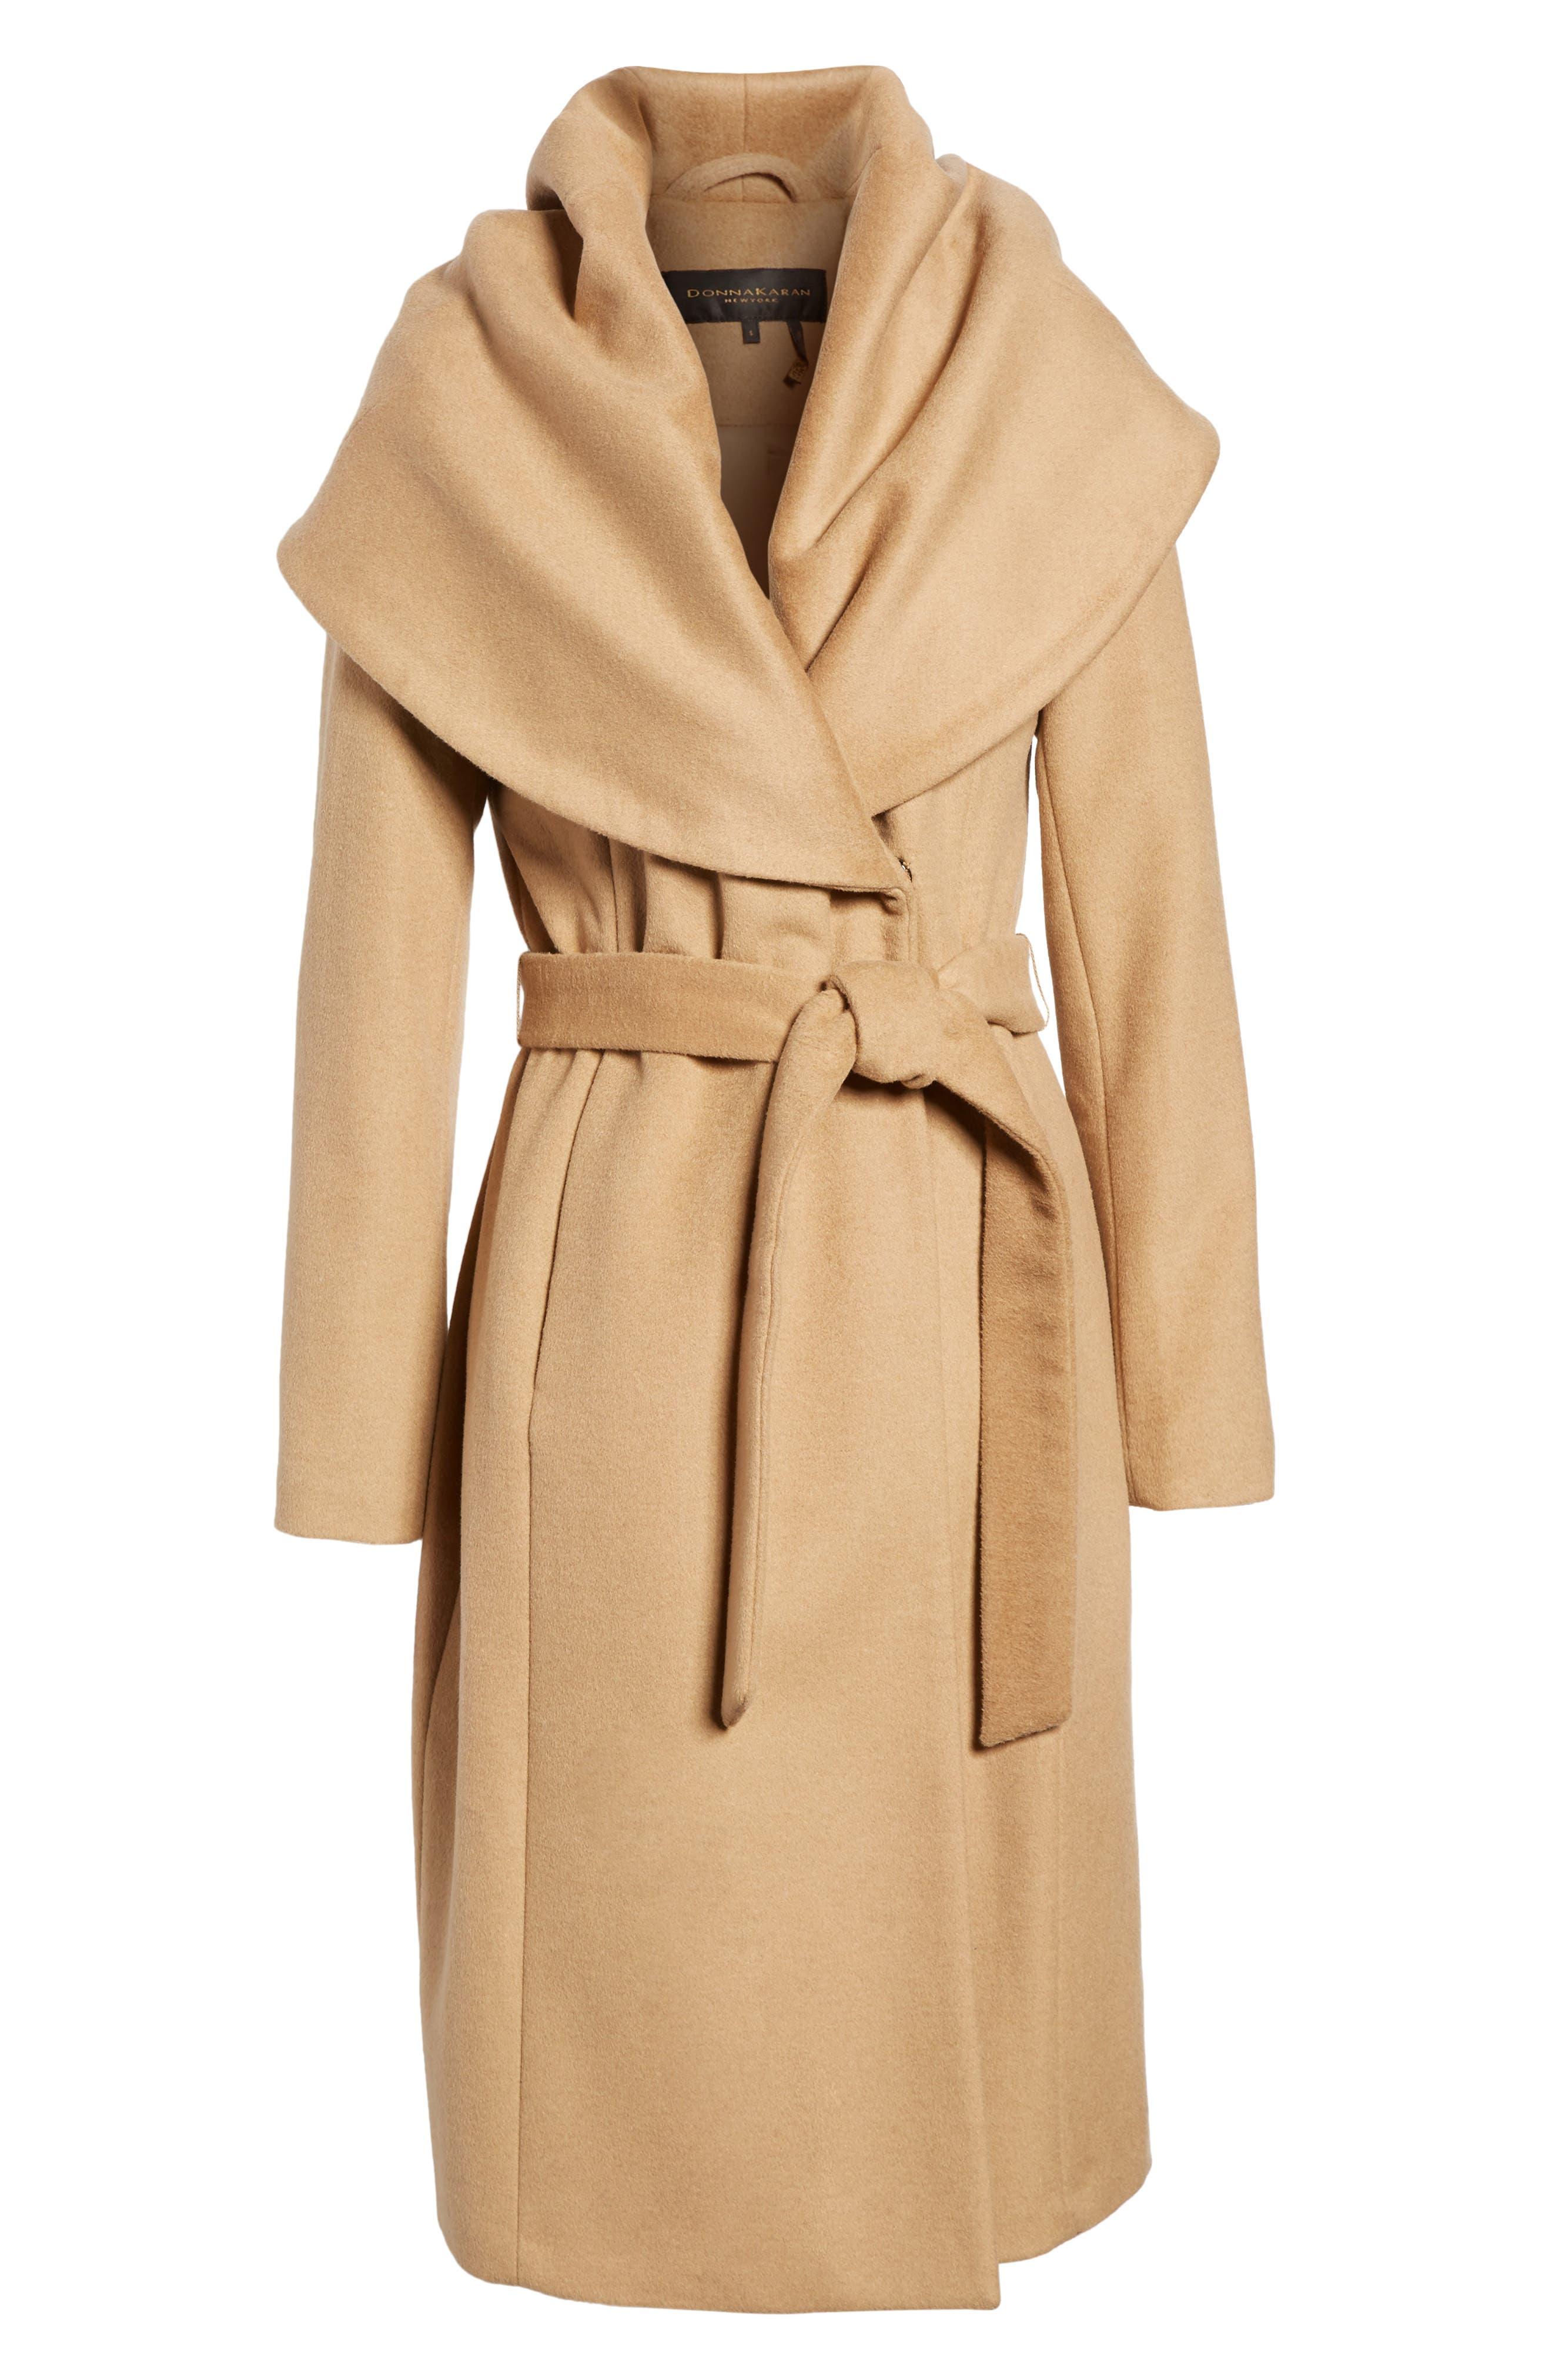 DKNY Wool Blend Shawl Collar Wrap Coat,                             Alternate thumbnail 6, color,                             Camel